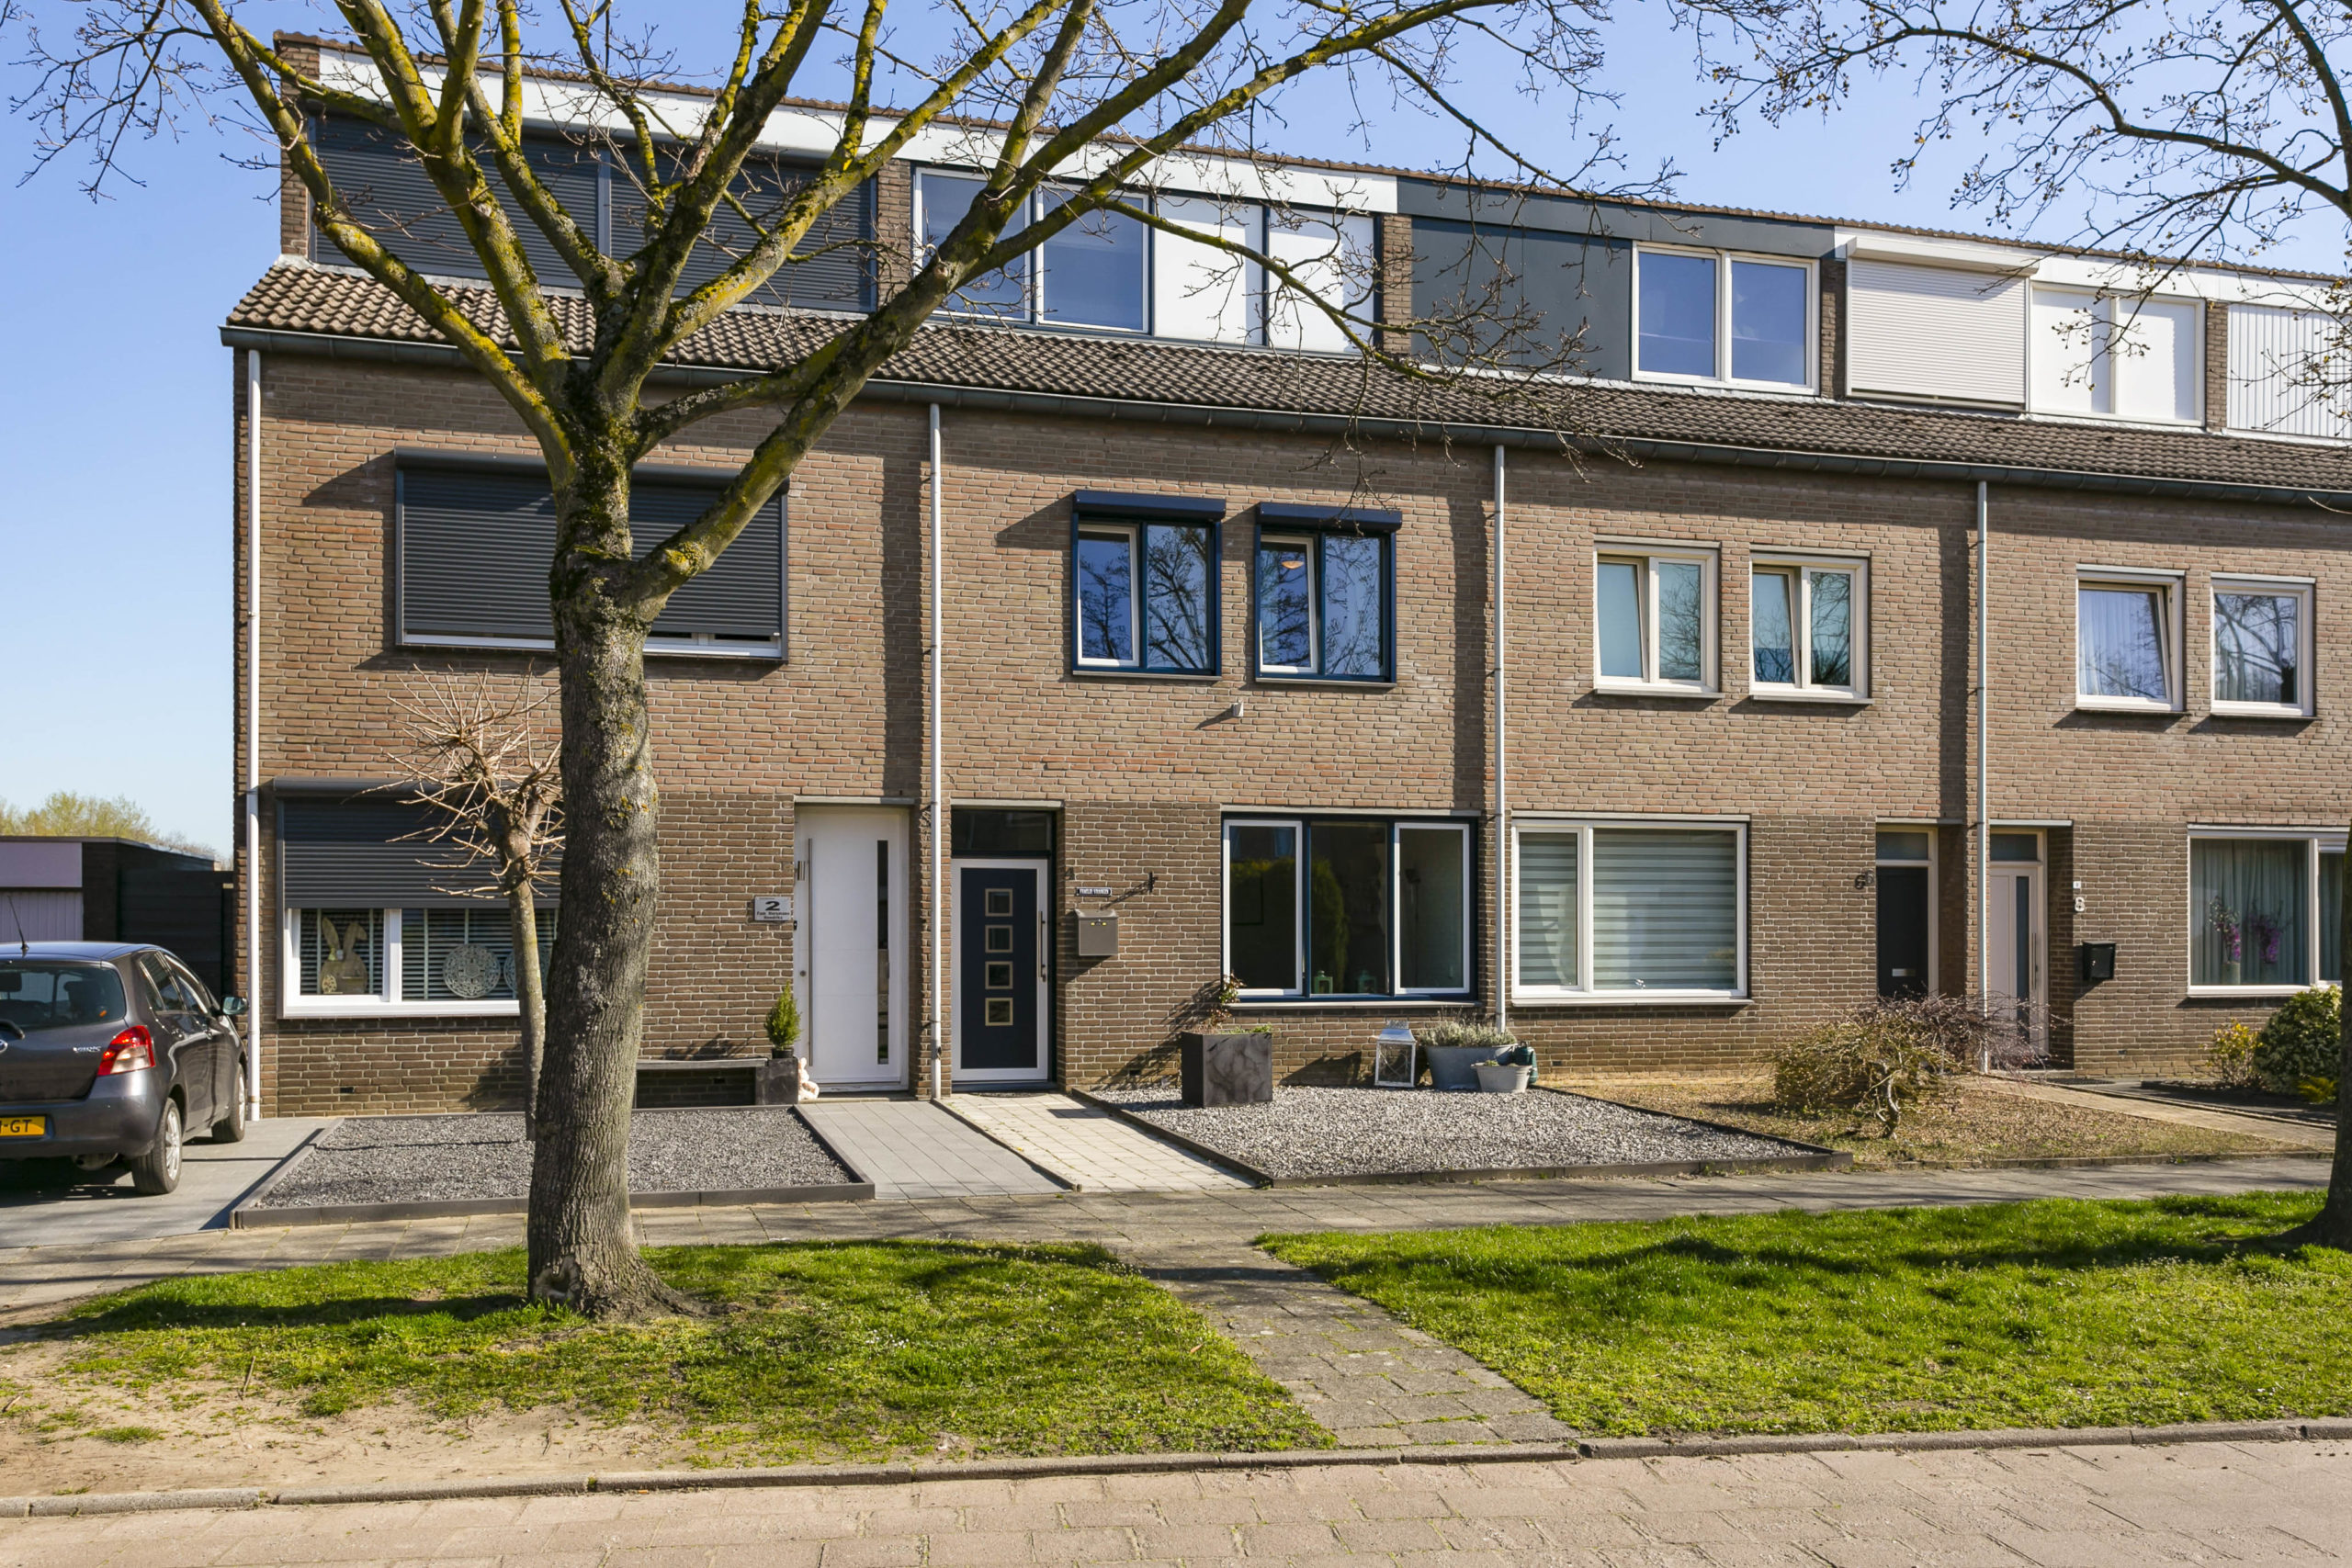 4_Gerichtstraat4Stein-03